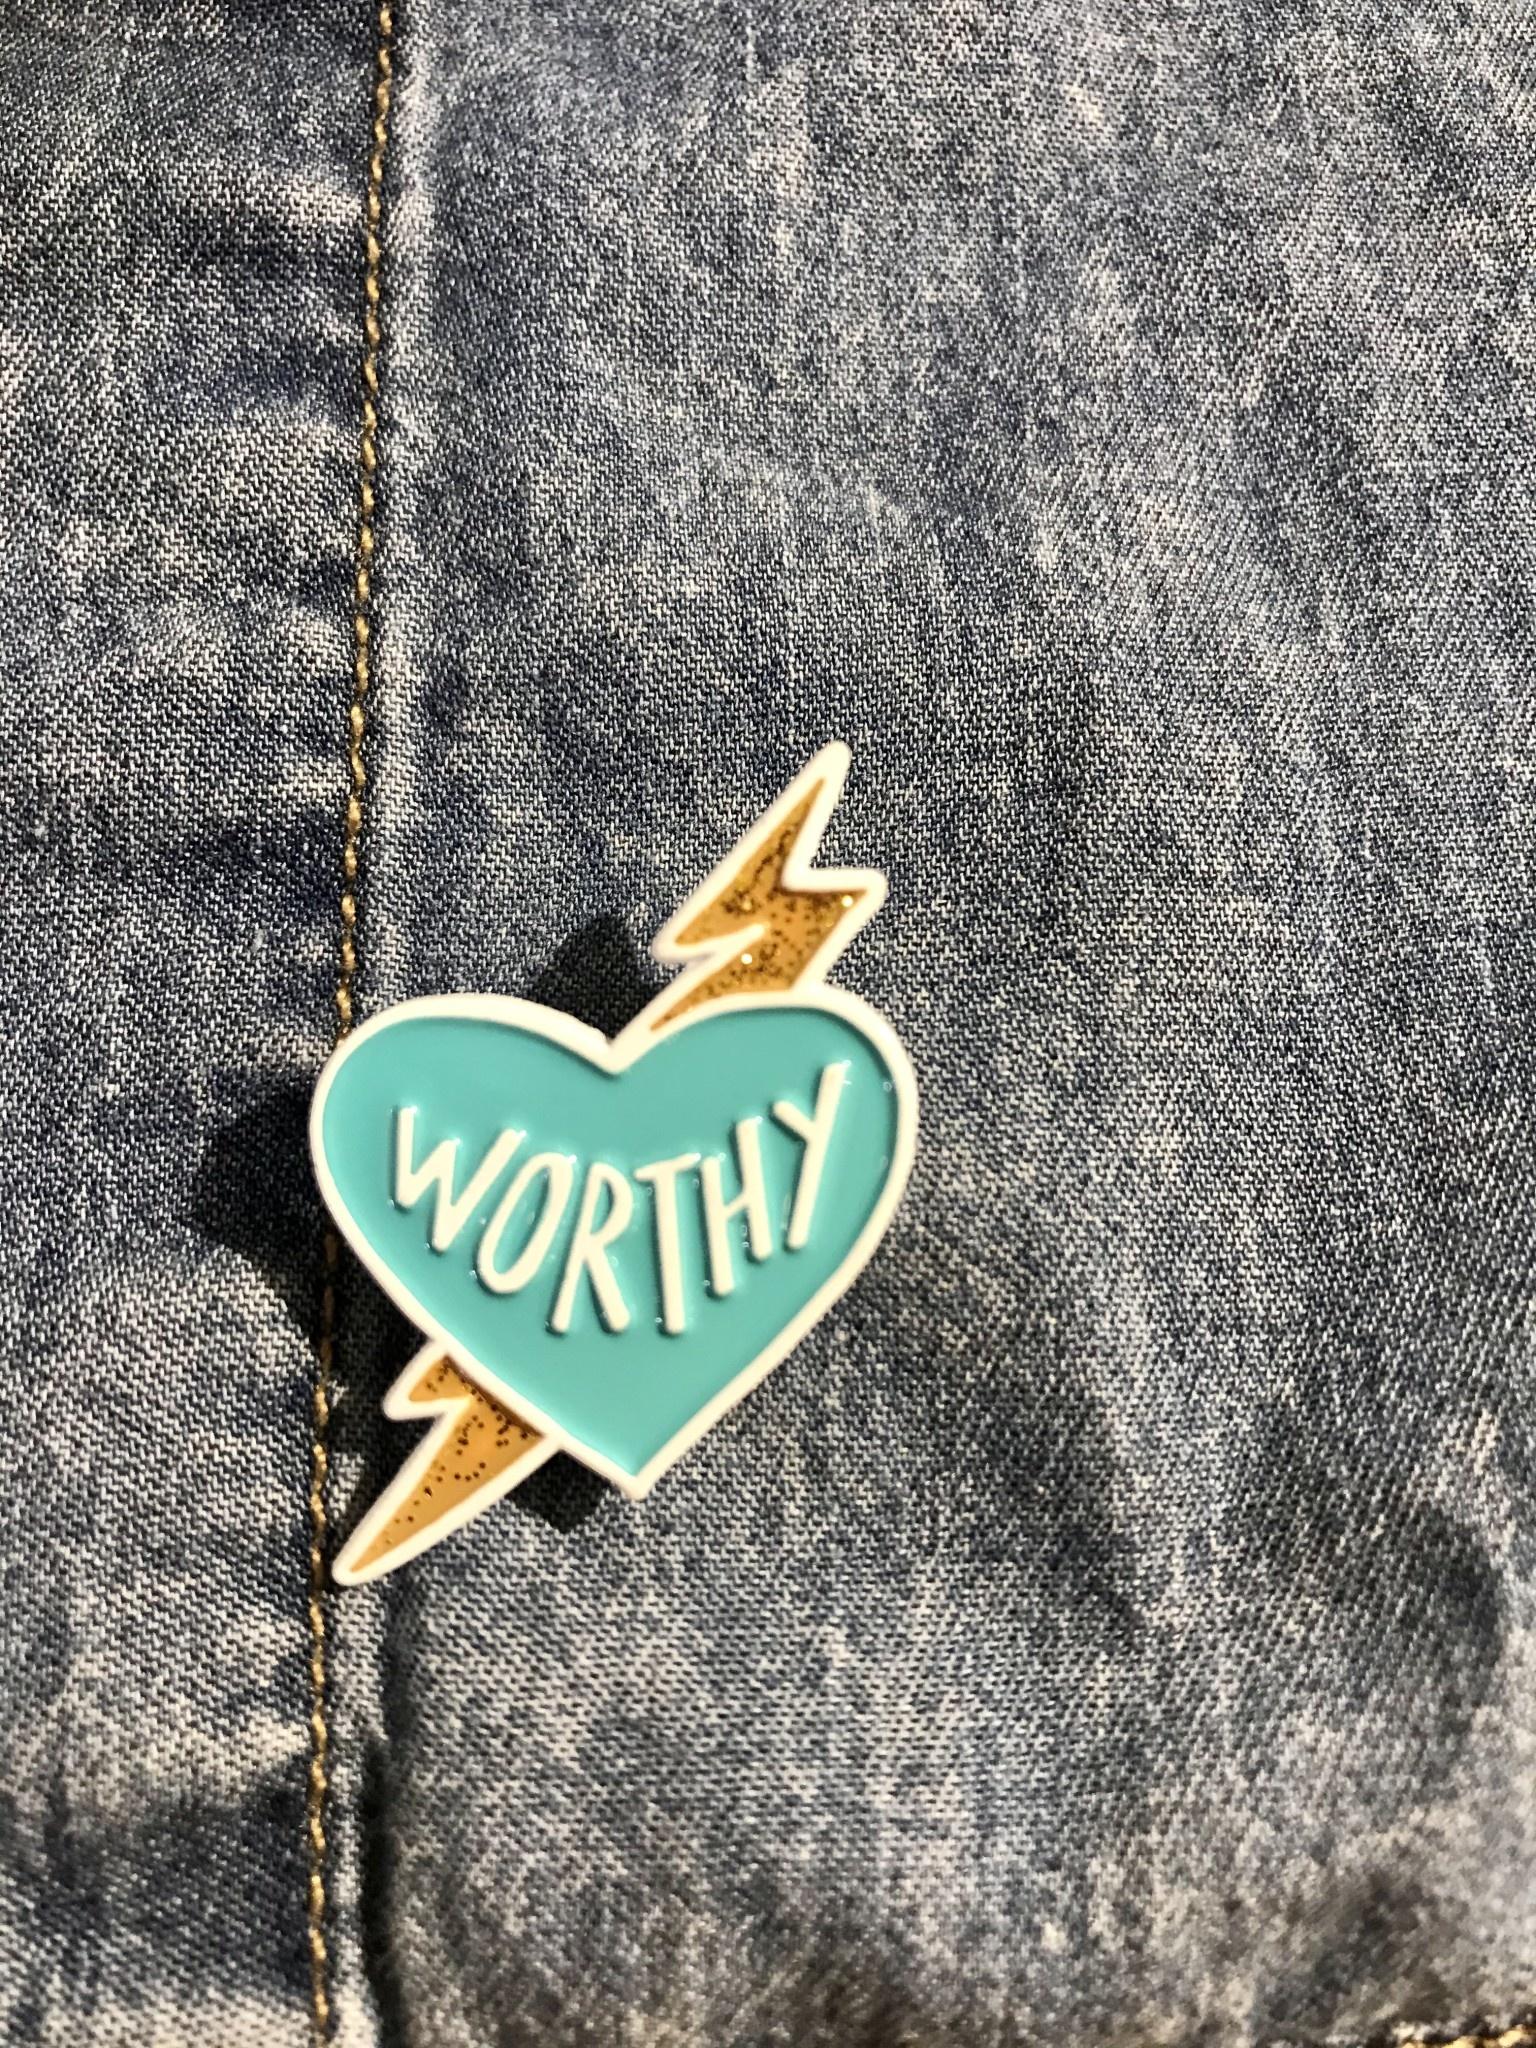 Band of Weirdos / Moss Love *Worthy Enamel Pin